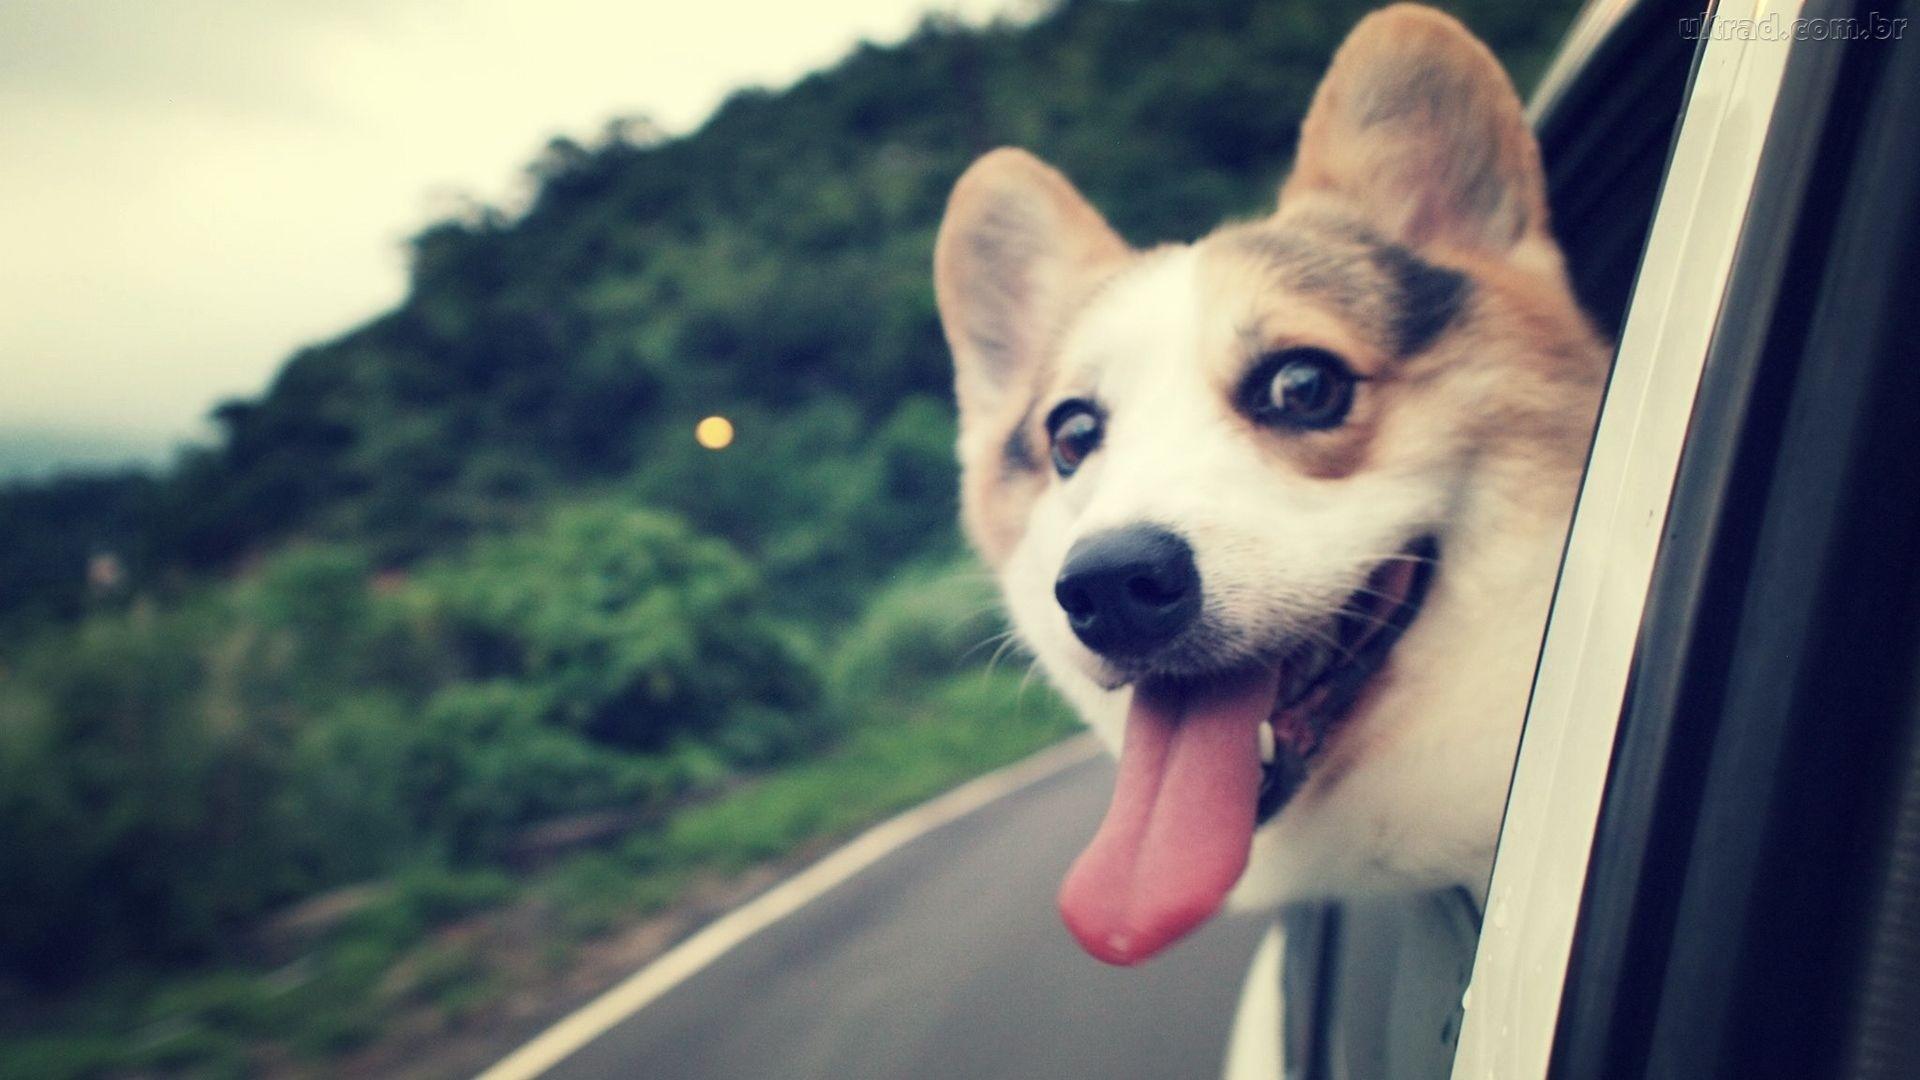 So doge meme – Doge Wallpaper (1920×1080) (226017)